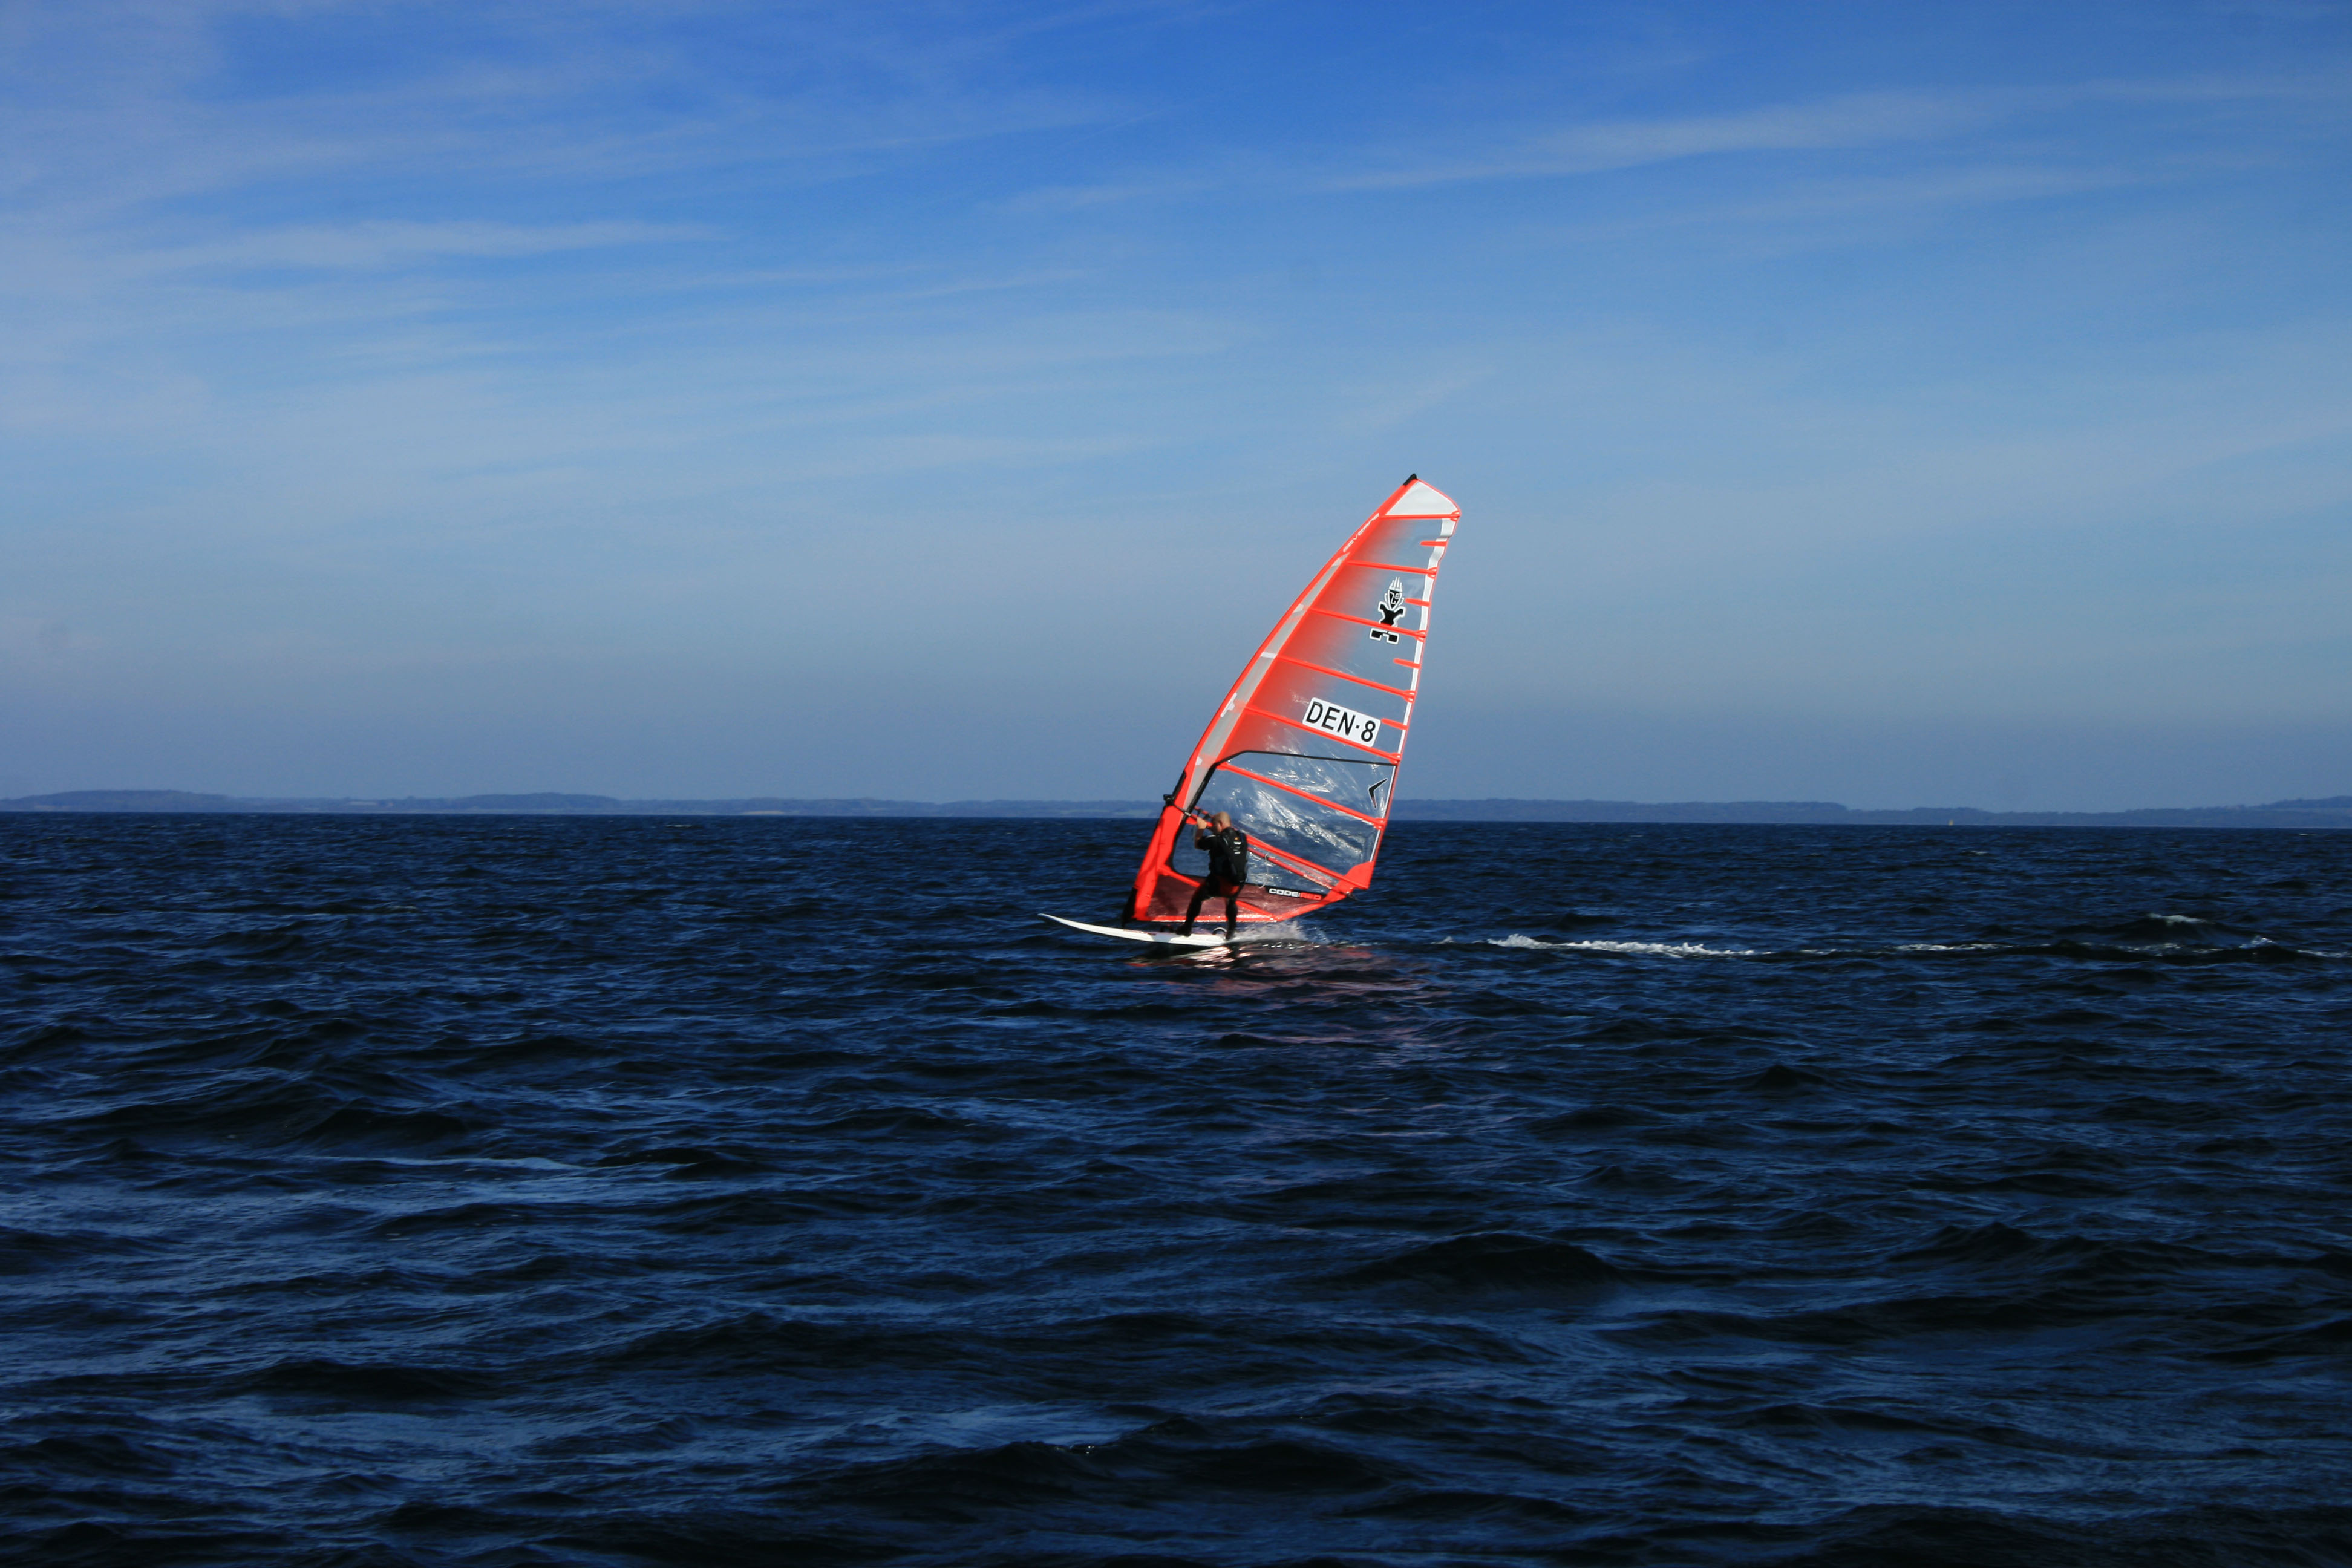 2008 NP Ø Grand Prix - Orø Rundt (copyright Jan NIelsen)